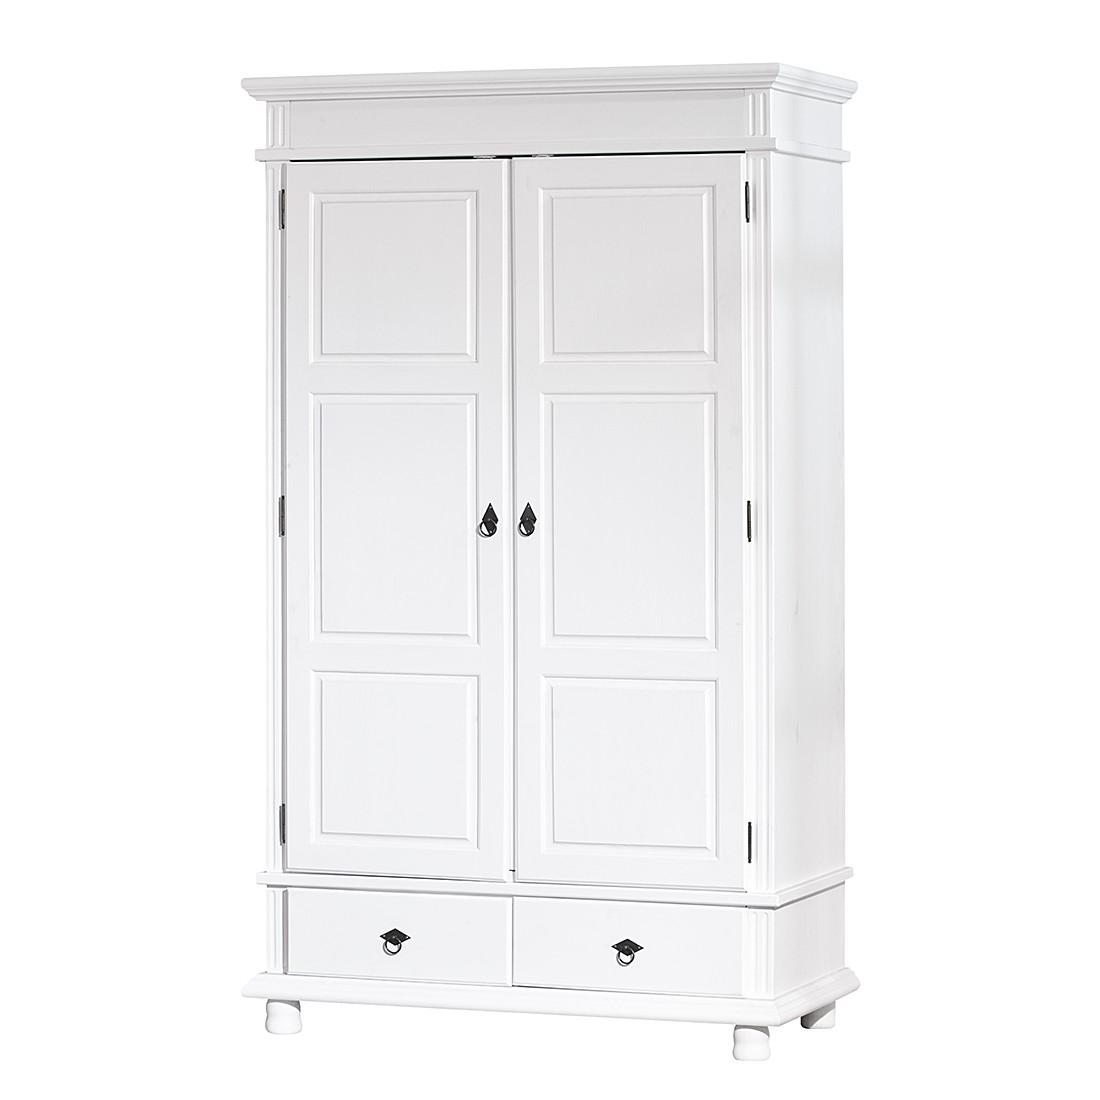 Kleiderschrank Nila - Kiefer massiv - Weiß lackiert - Schrank.info ...